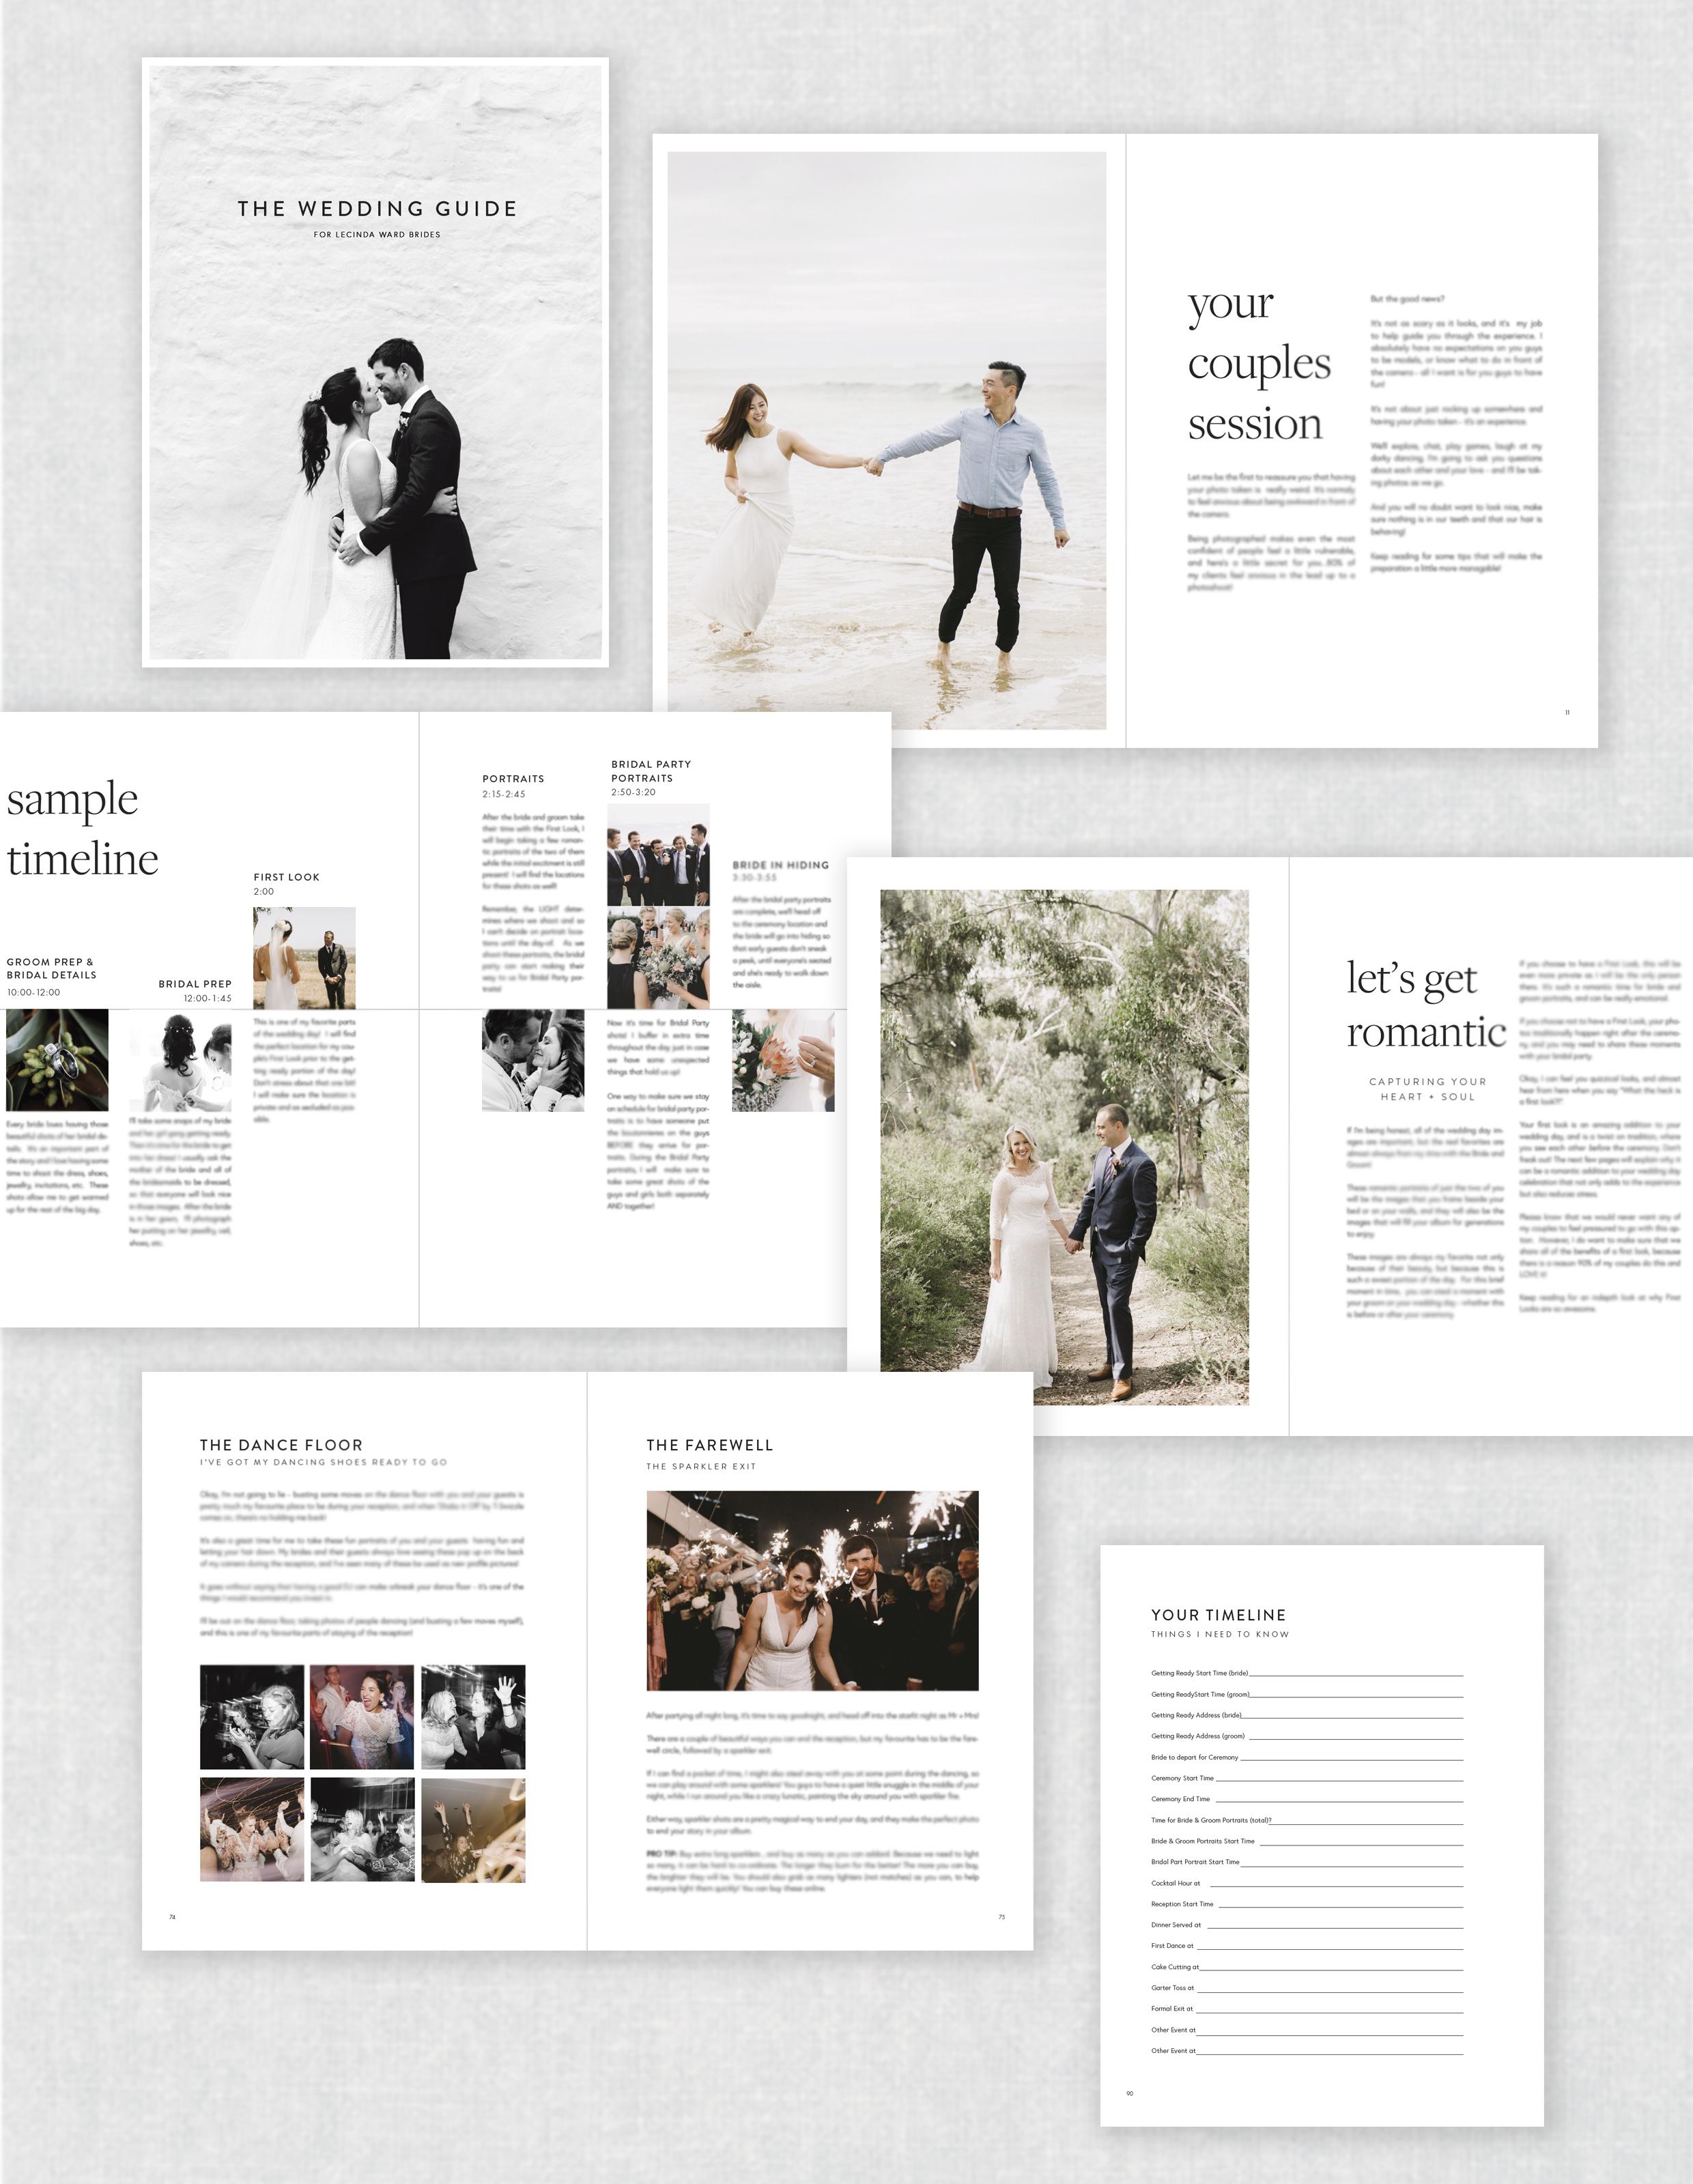 Wedding Planning Guide Spread.jpg